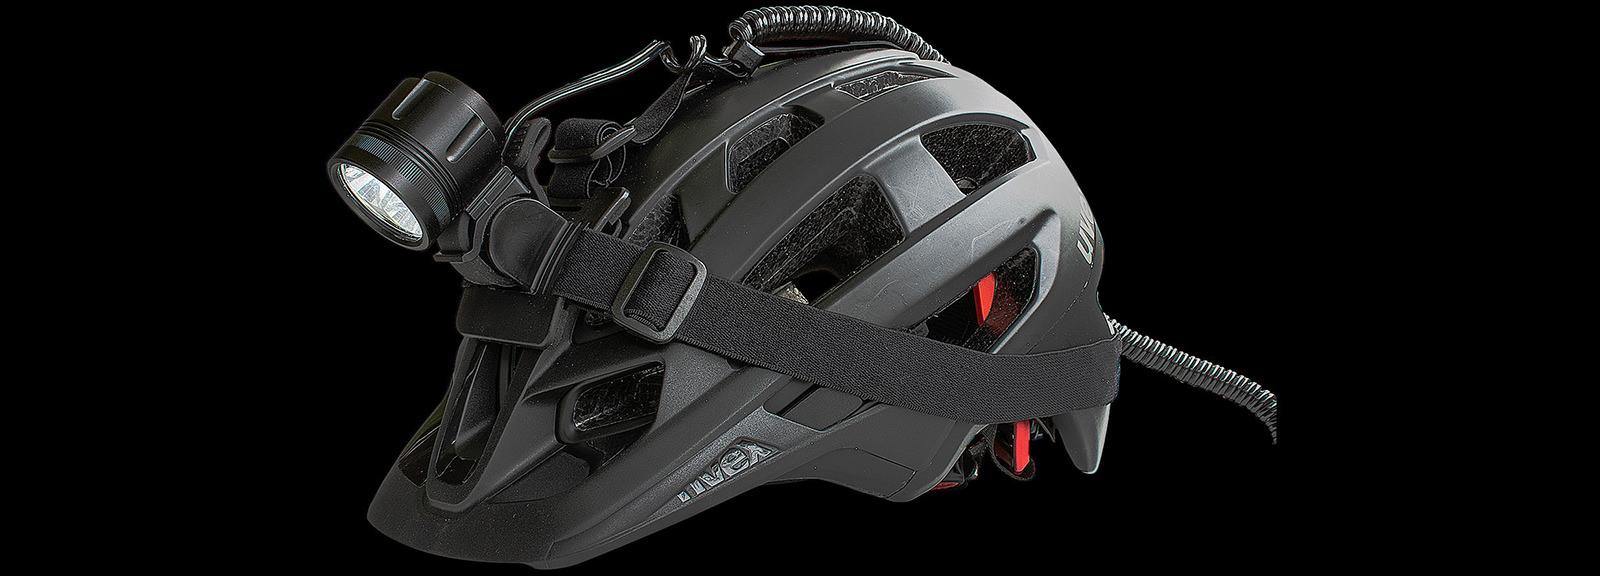 Bike light ØM3 mounted on a helmet